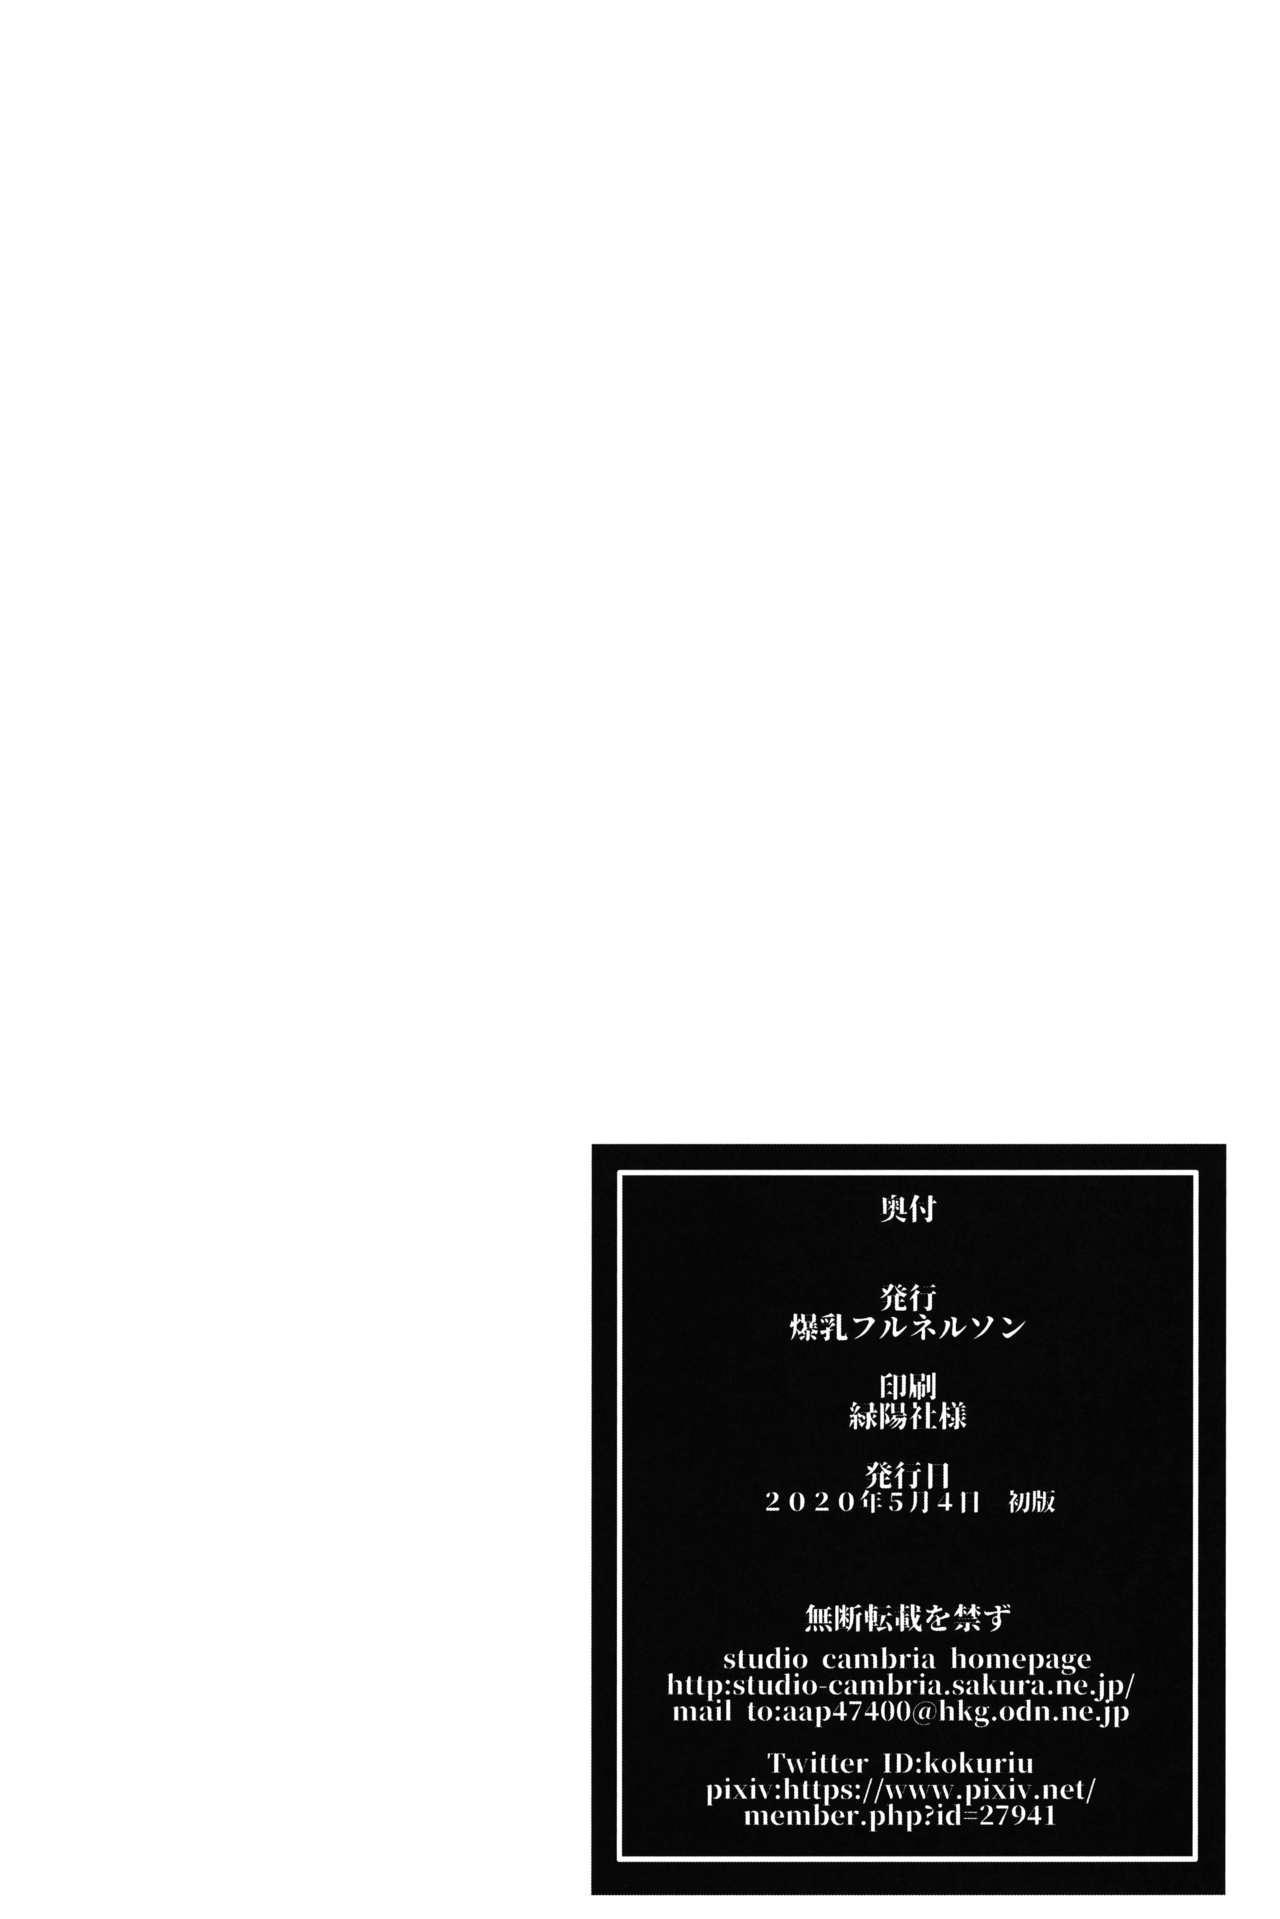 Youkoso Kokujin Koubi Beya e final discipline 32